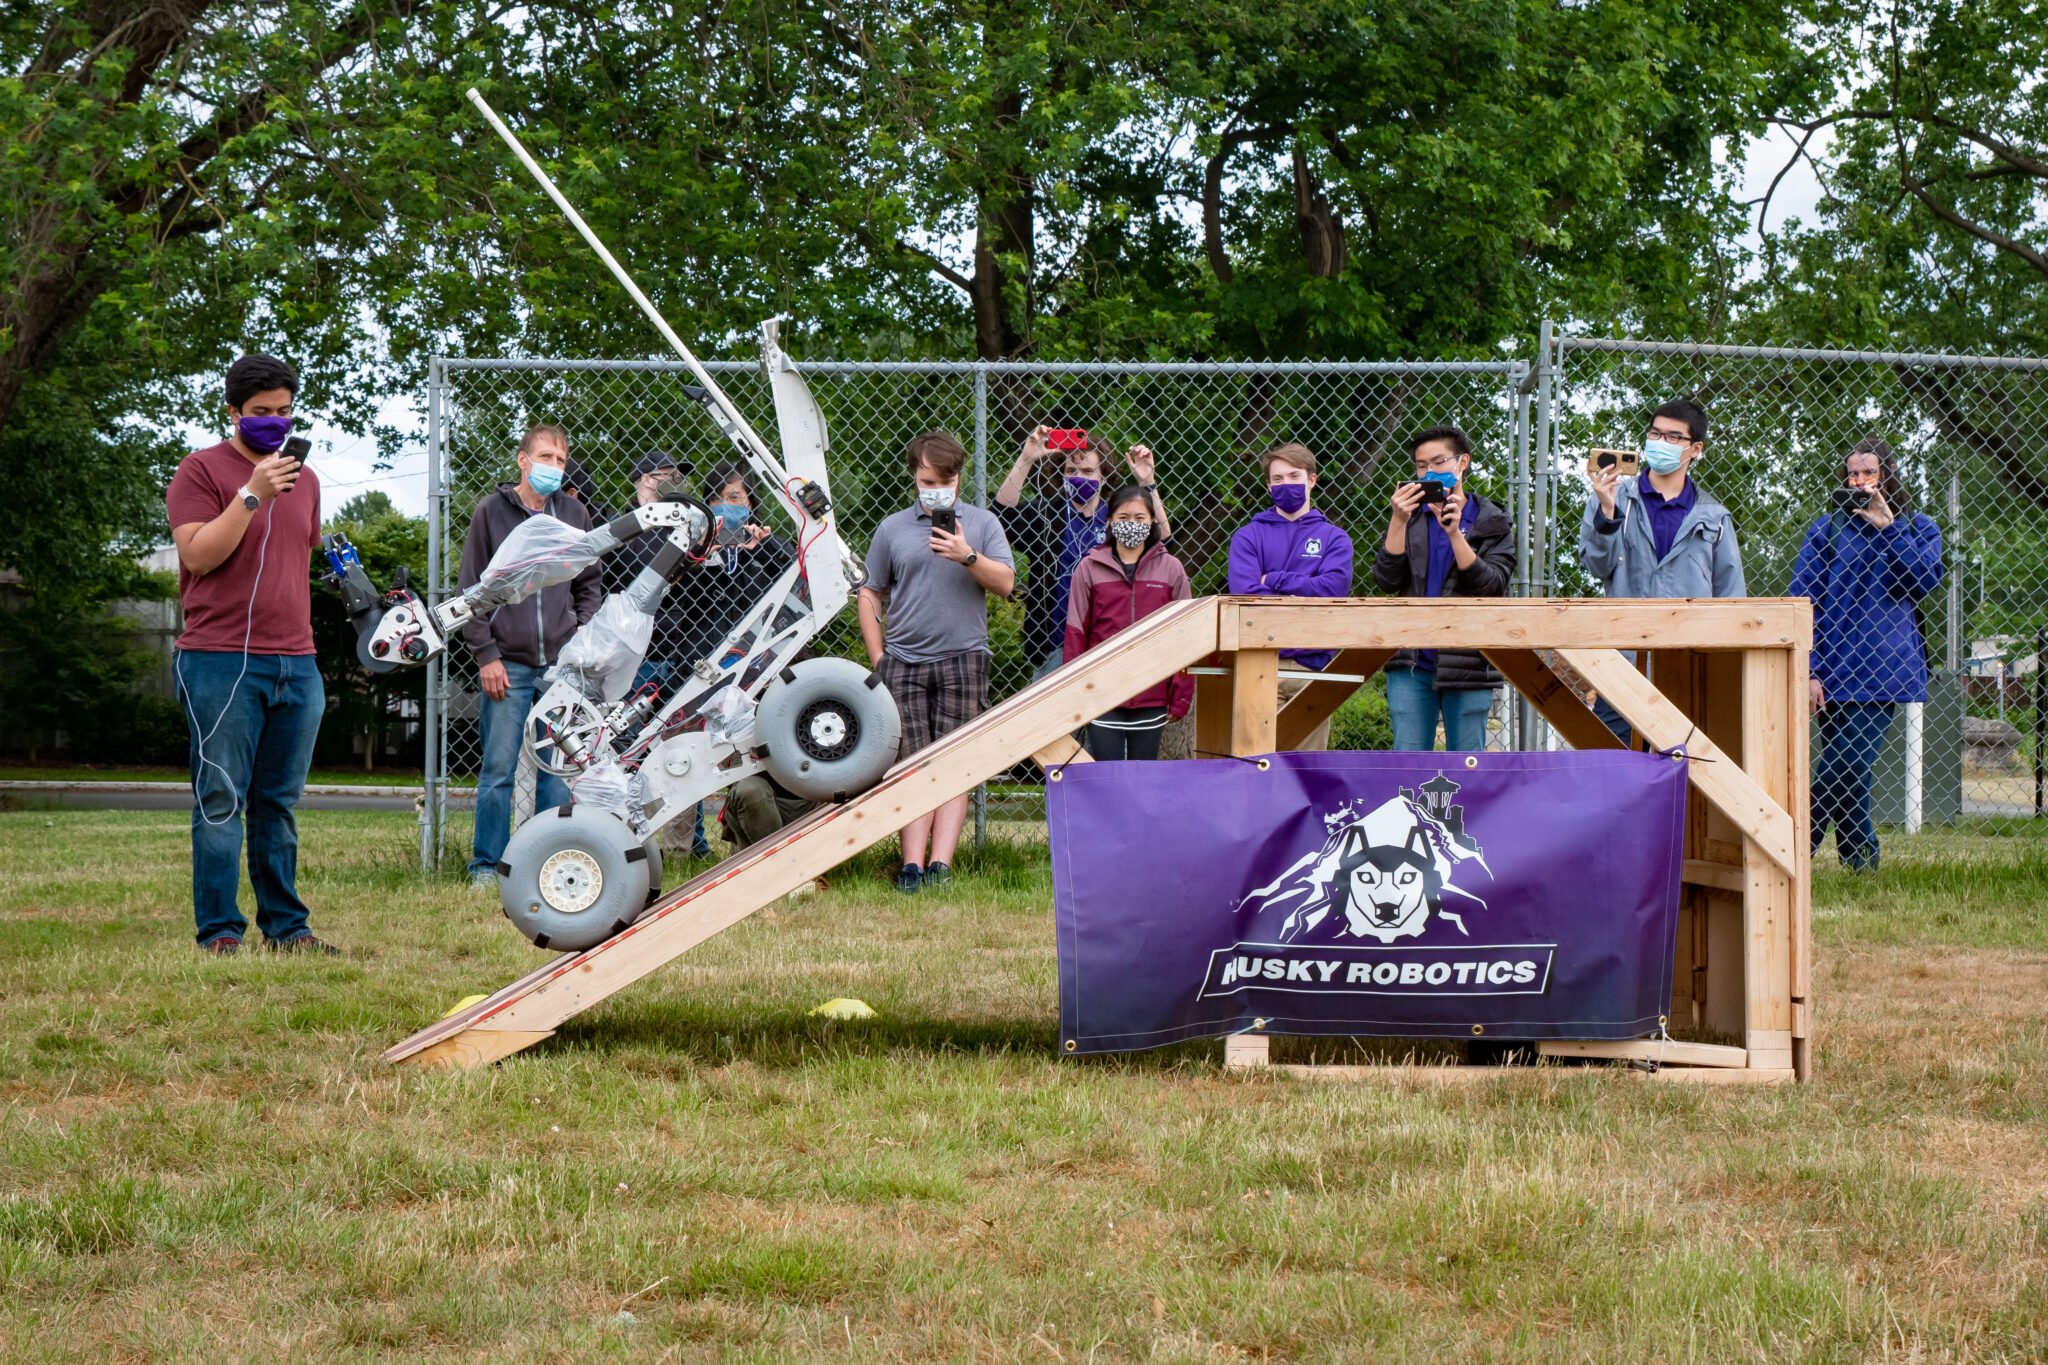 University of Washington's Husky Robotics is top U.S. team at Rover Challenge